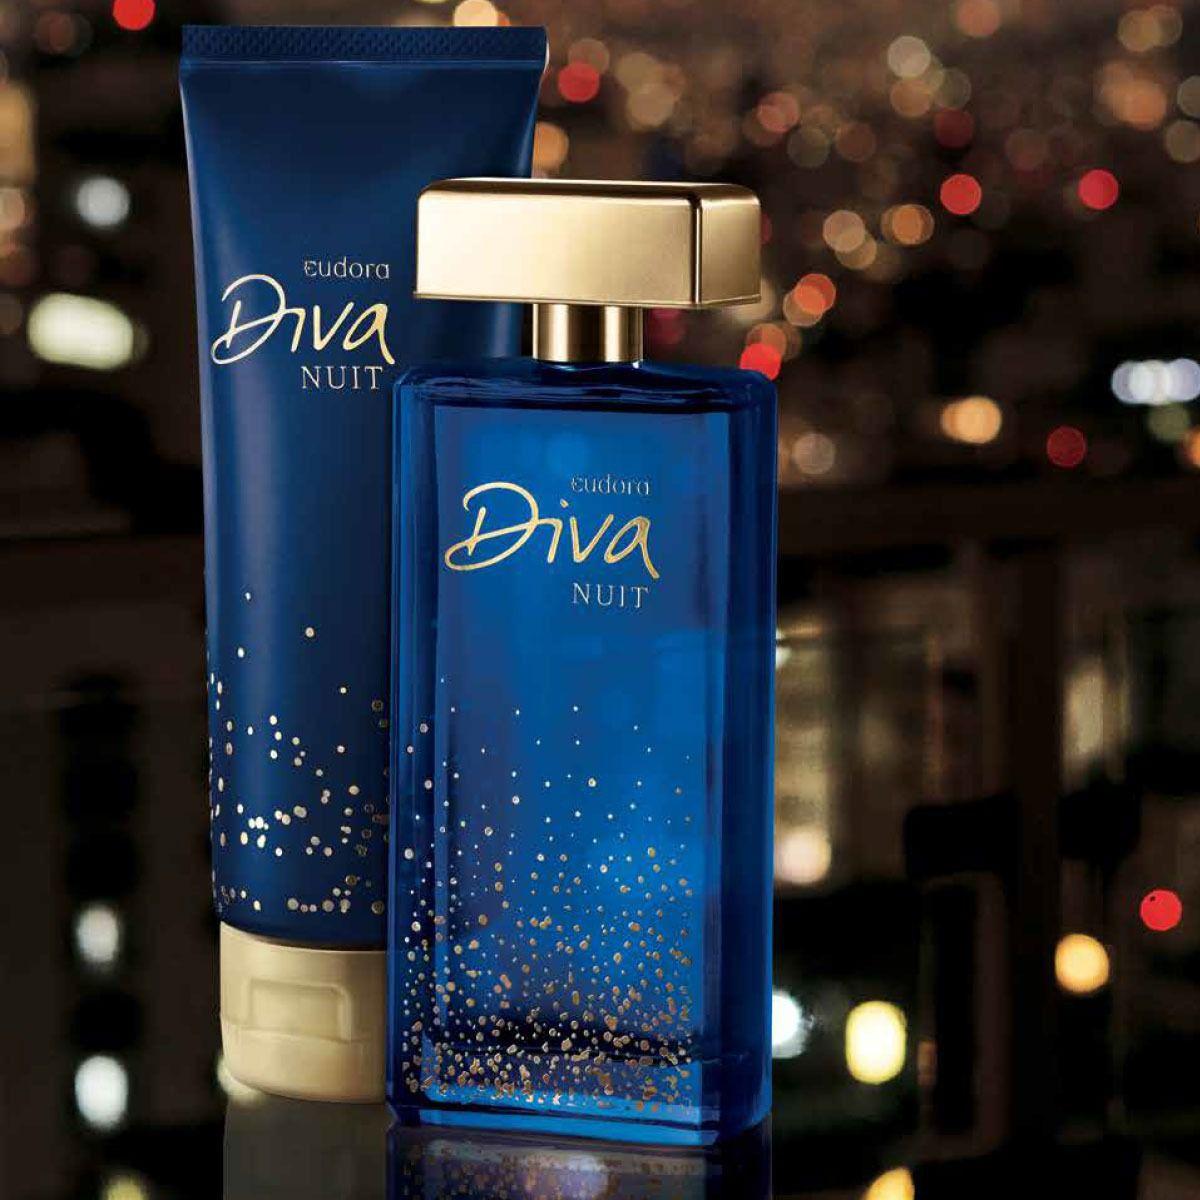 Kit Diva Nuit Eudora - Deo Colonia + Hidratante